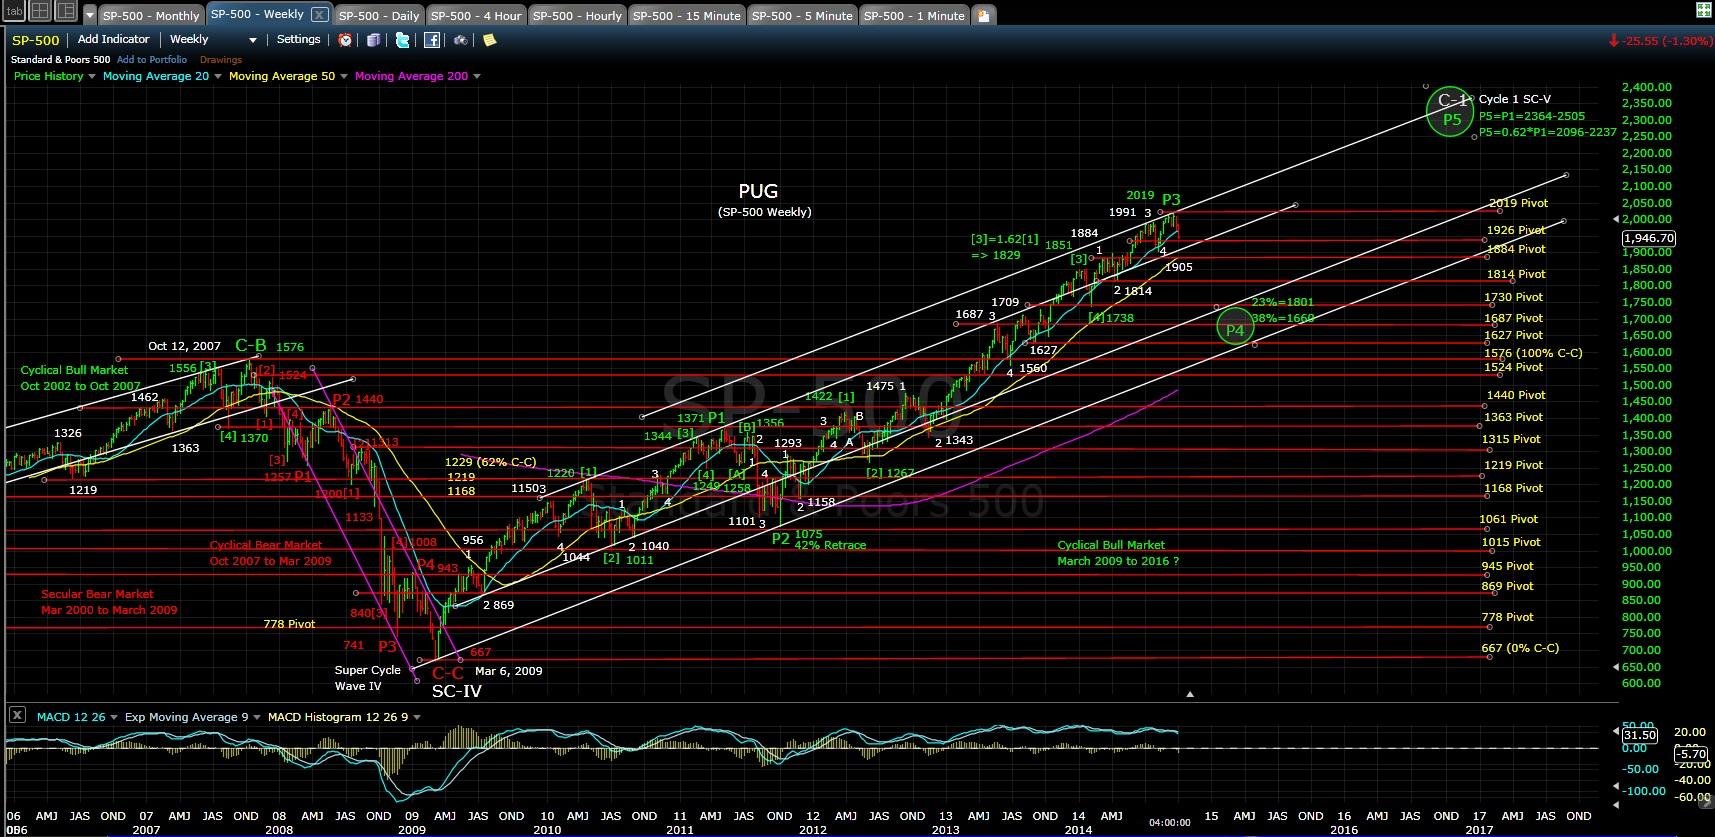 pug-sp-500-weekly-chart-eod-10-1-14